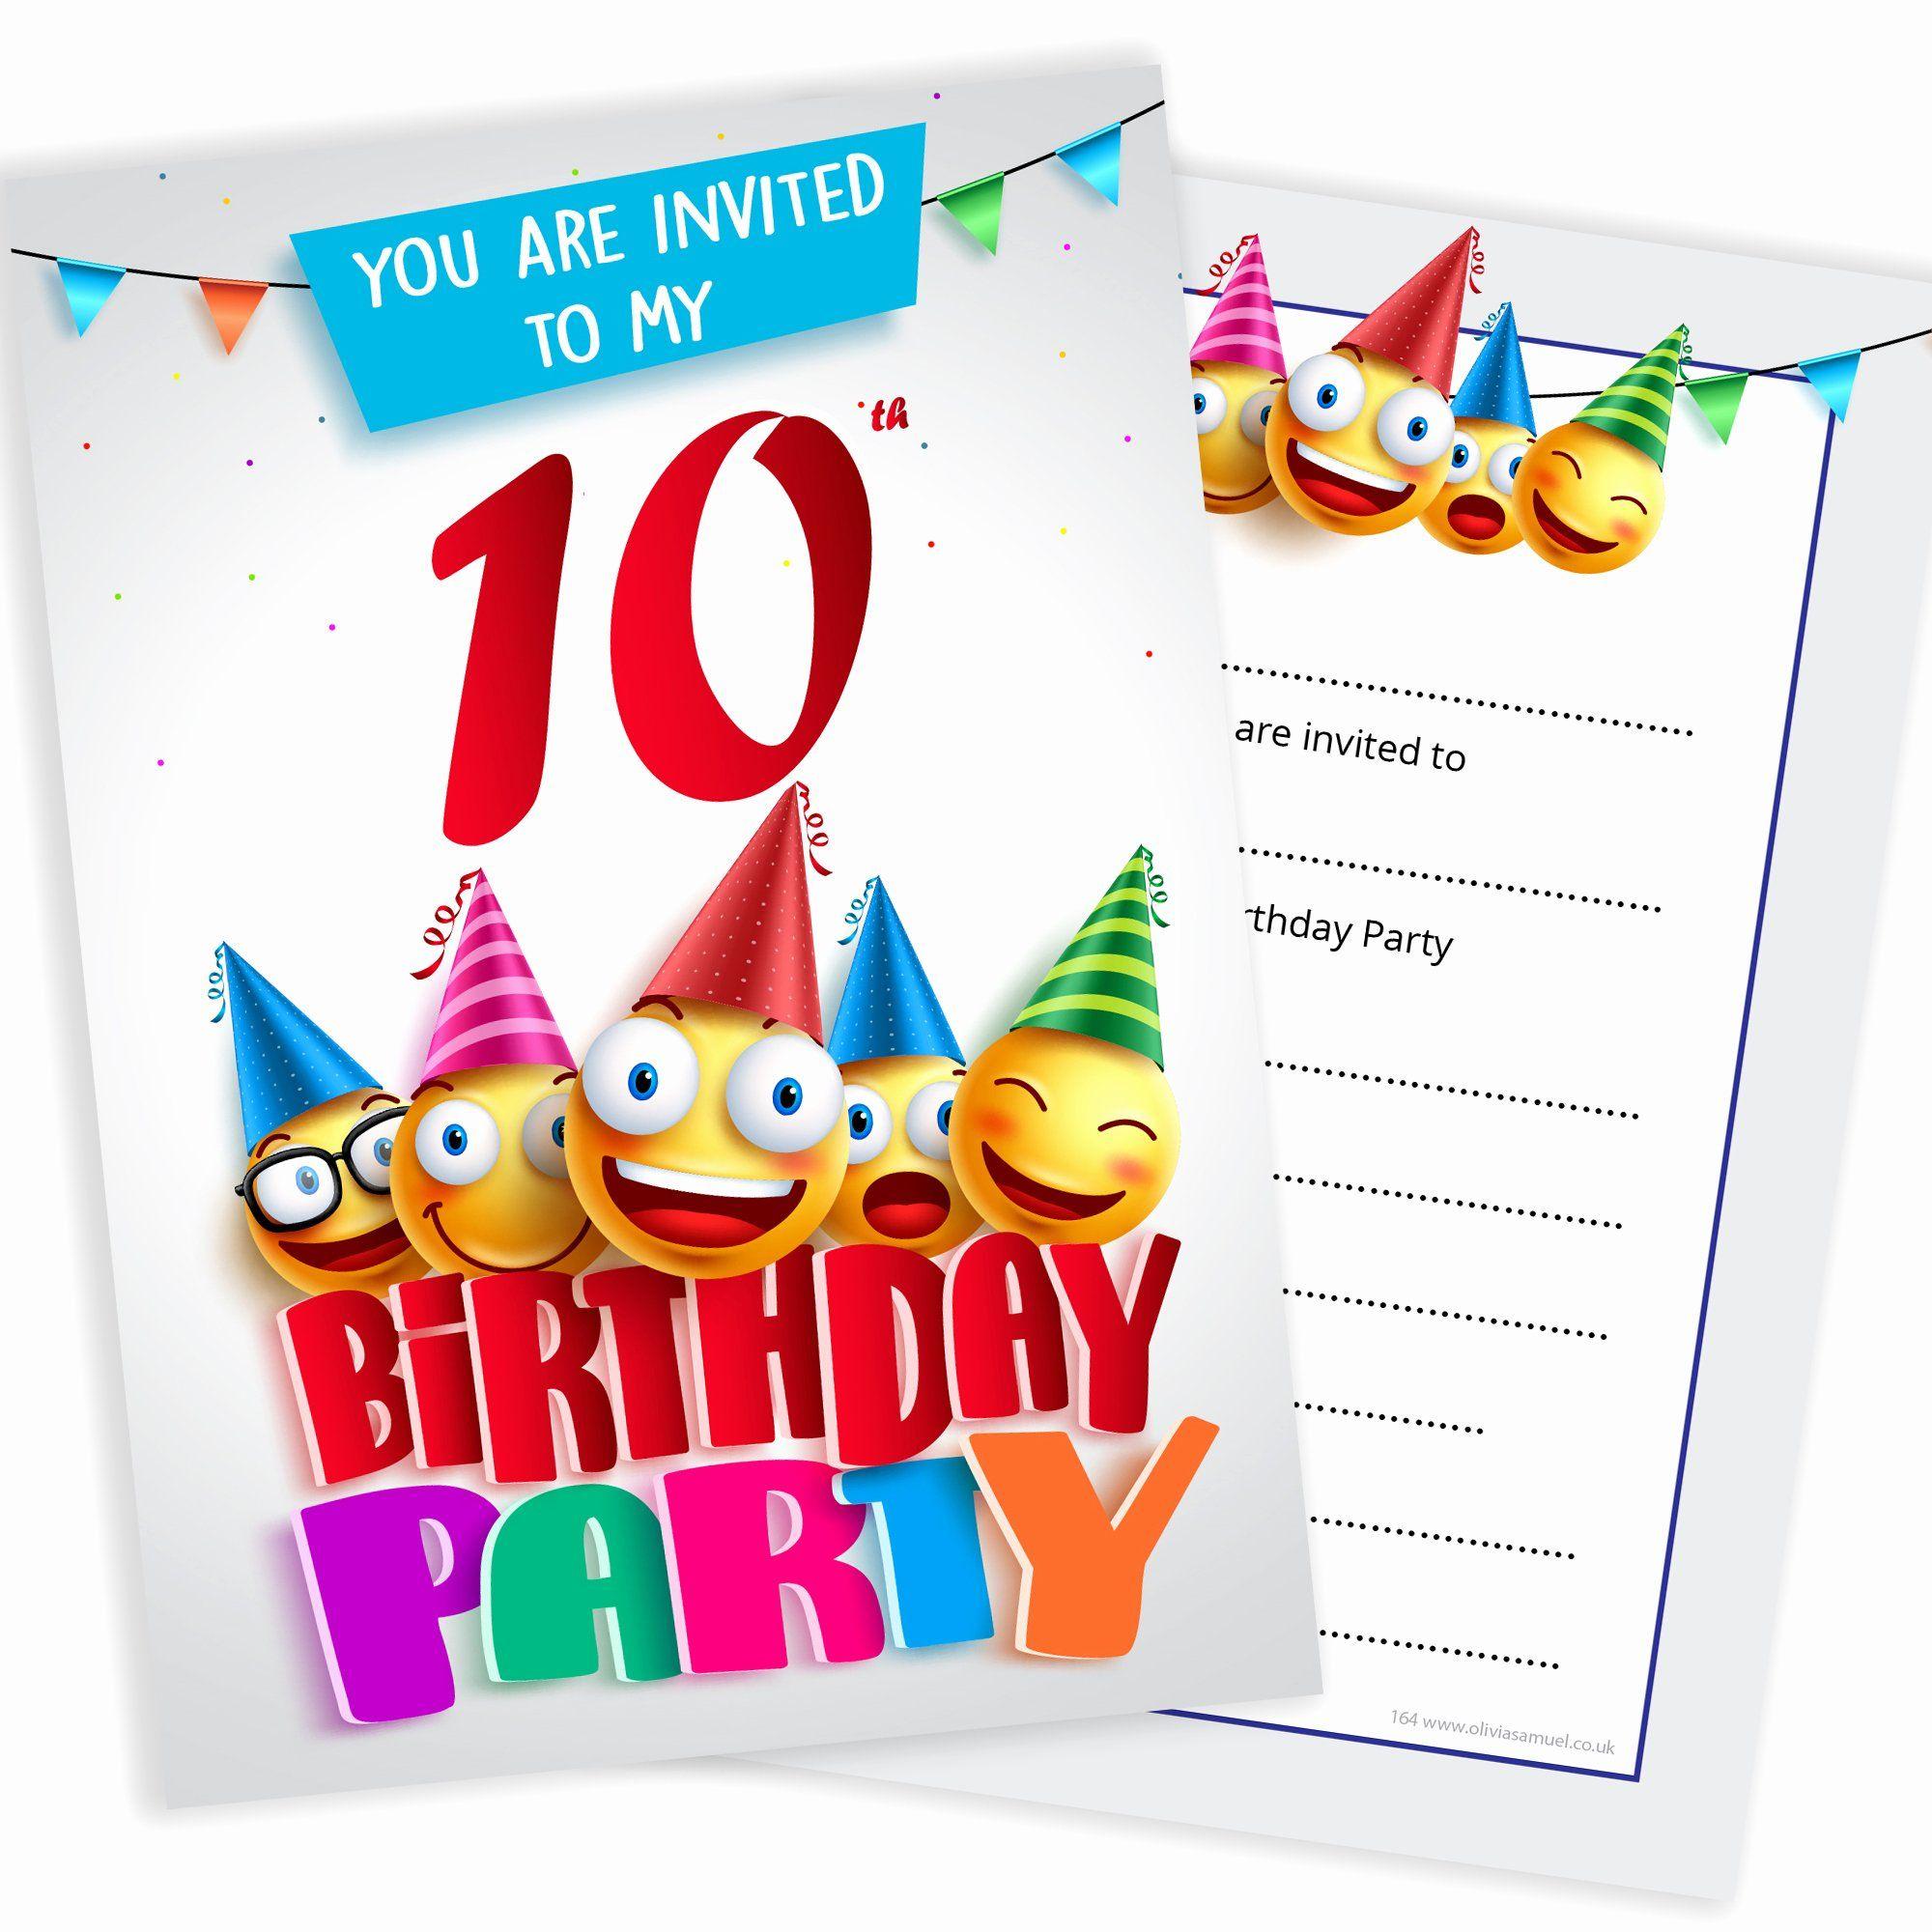 8th birthday invitation wording unique